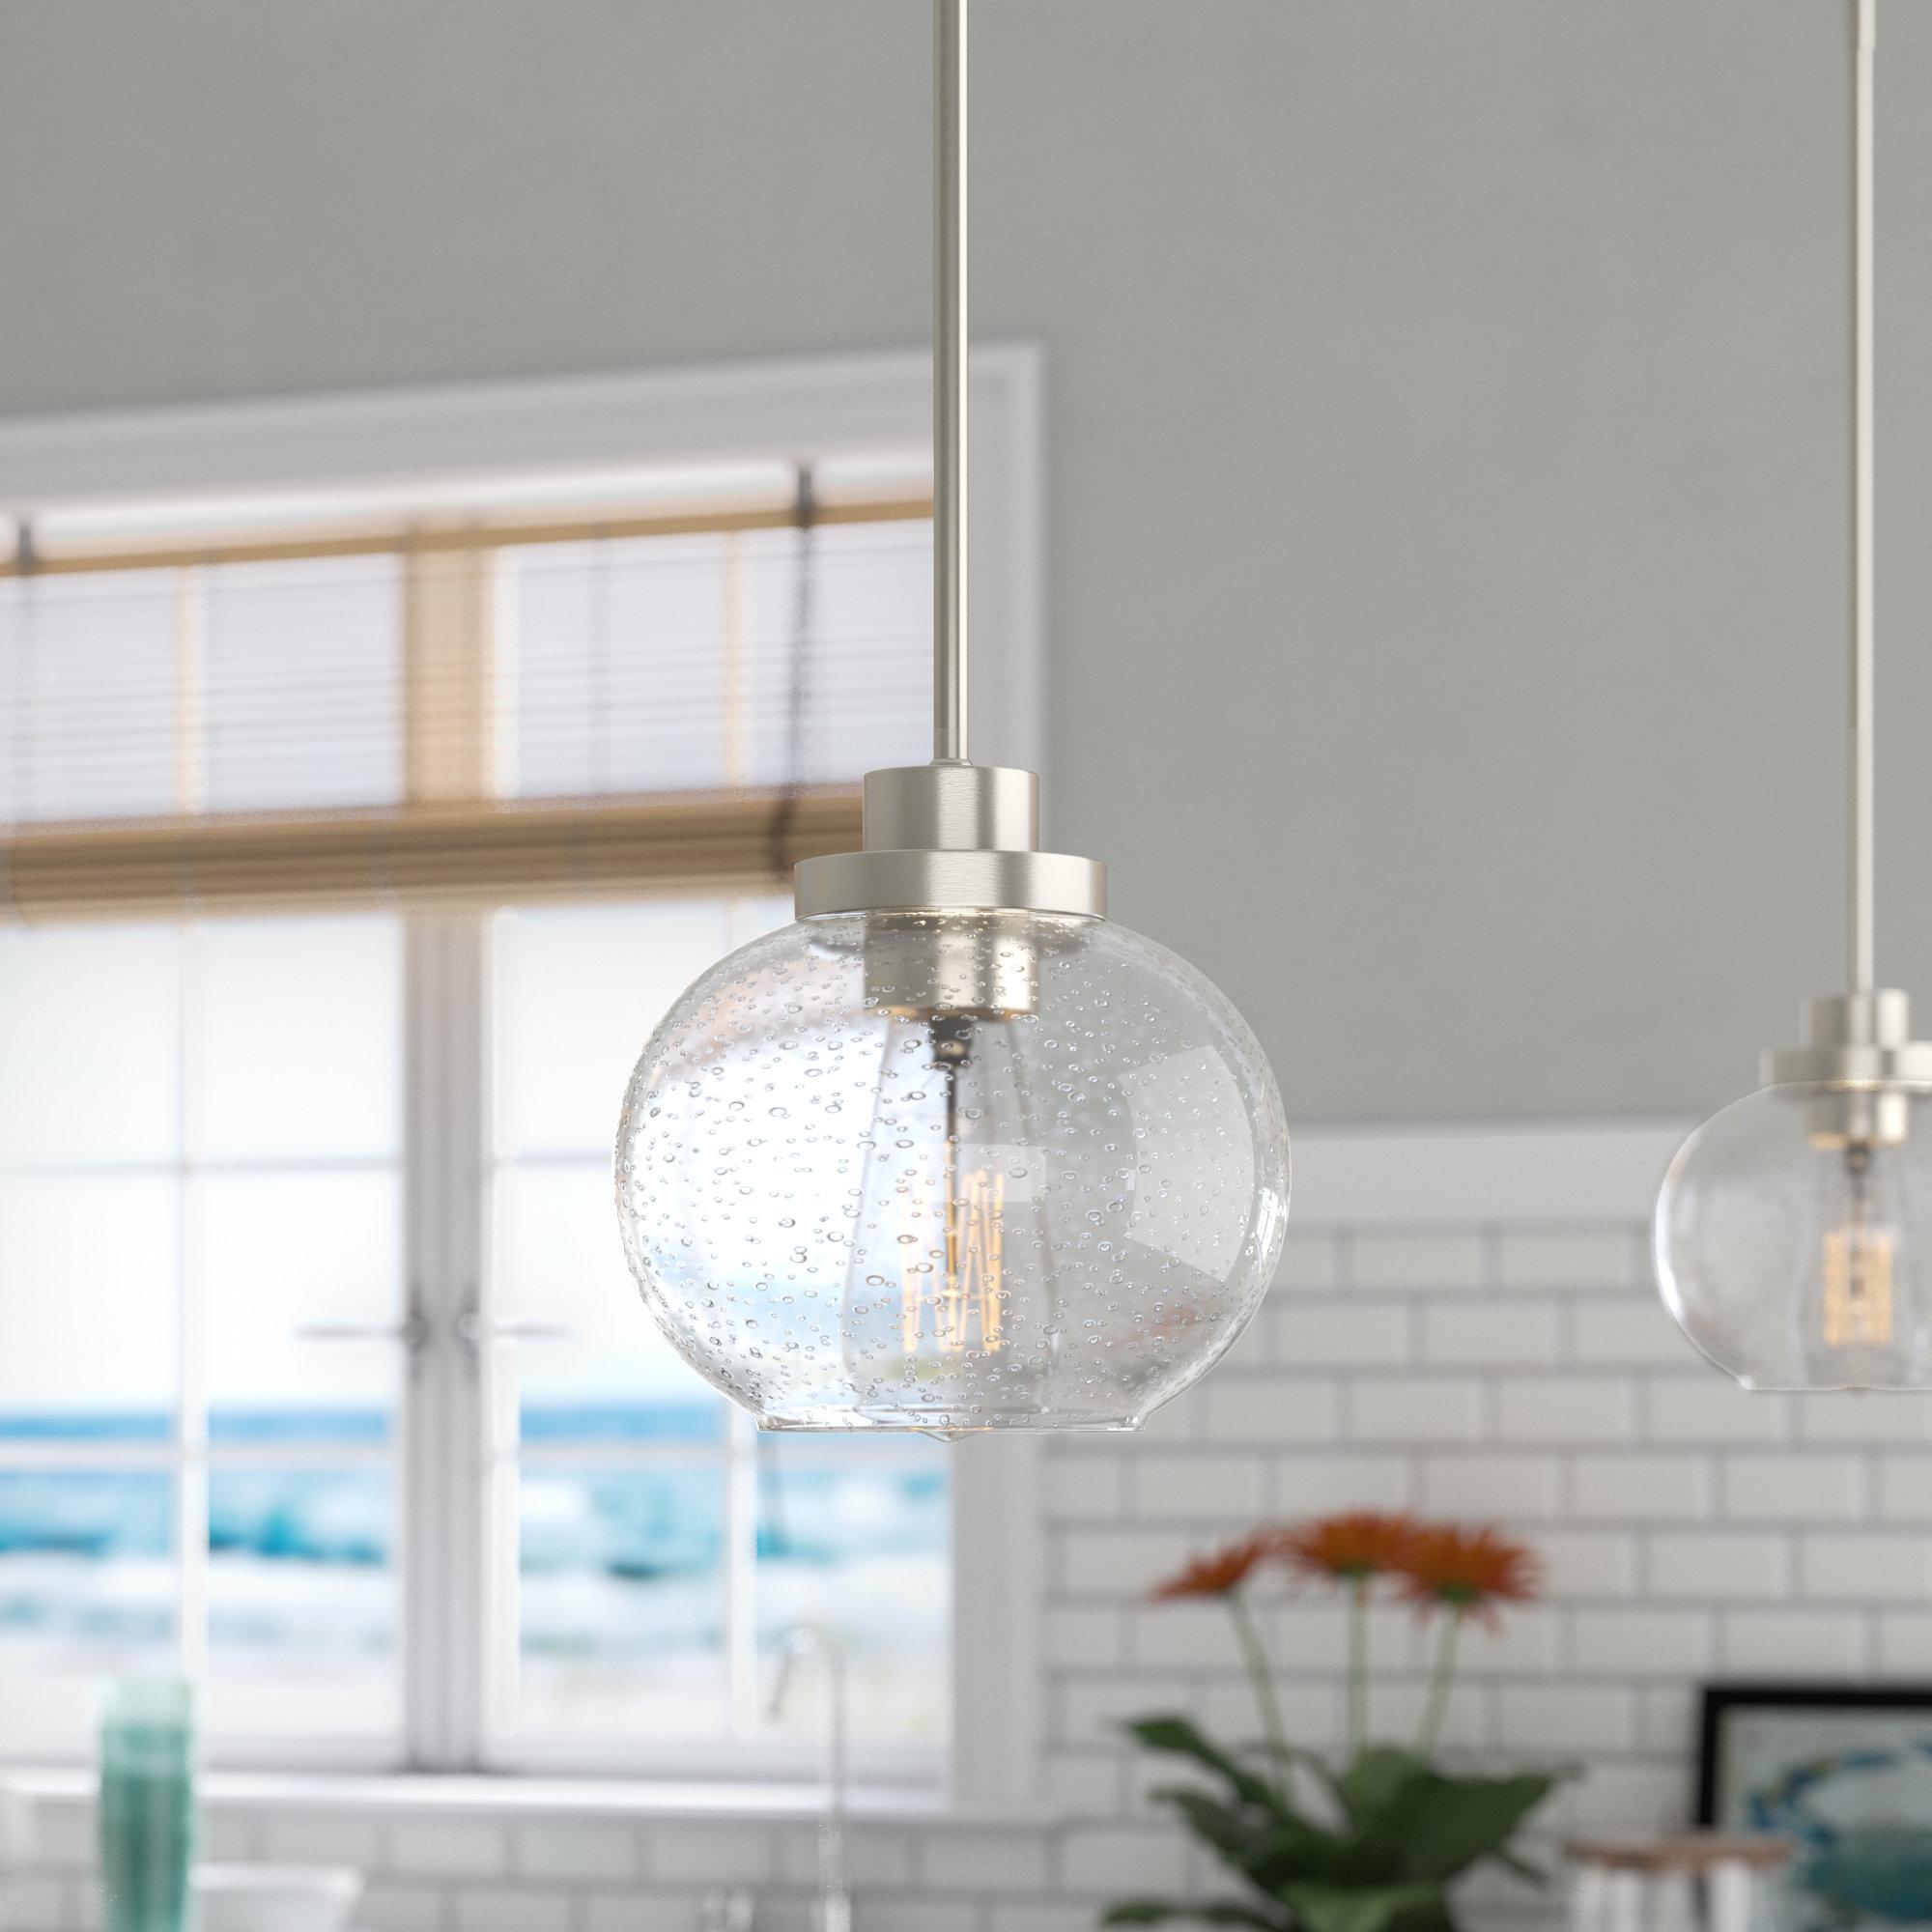 Preferred Wiesner 1 Light Globe Pendant Regarding 1 Light Globe Pendants (View 15 of 20)